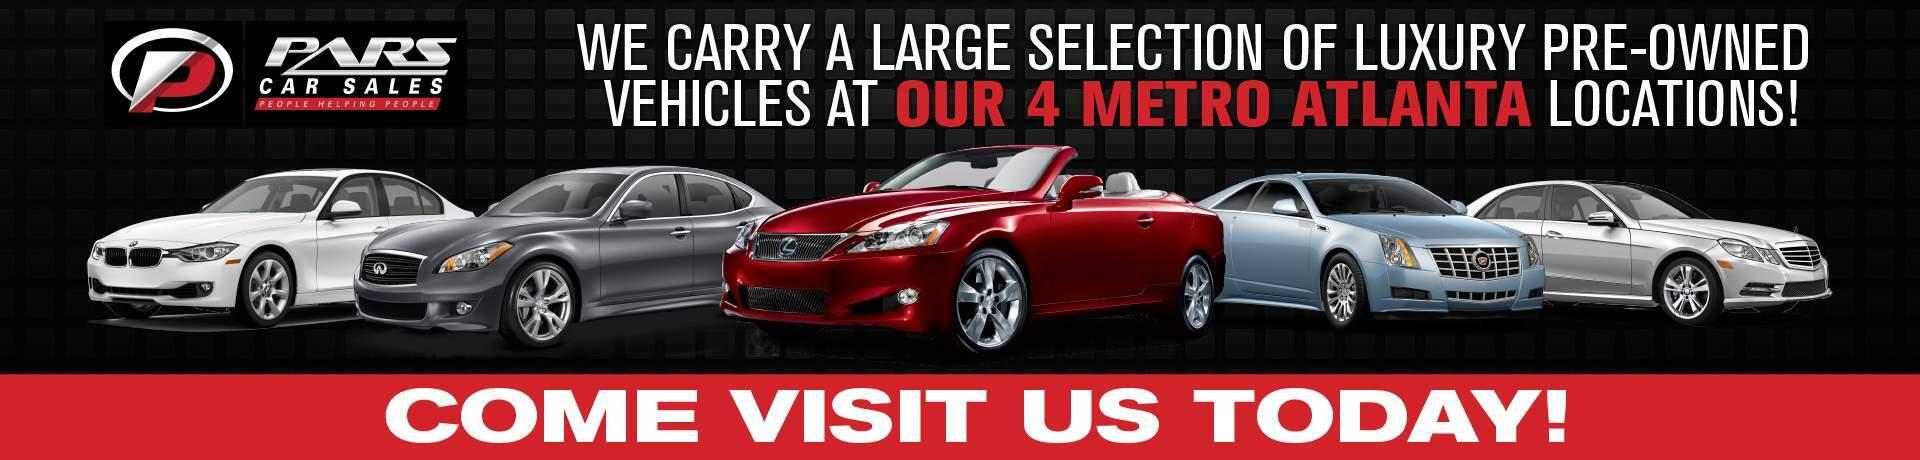 Morrow Used & Pre-Owned Cars | Morrow GA | Pars Car Sales